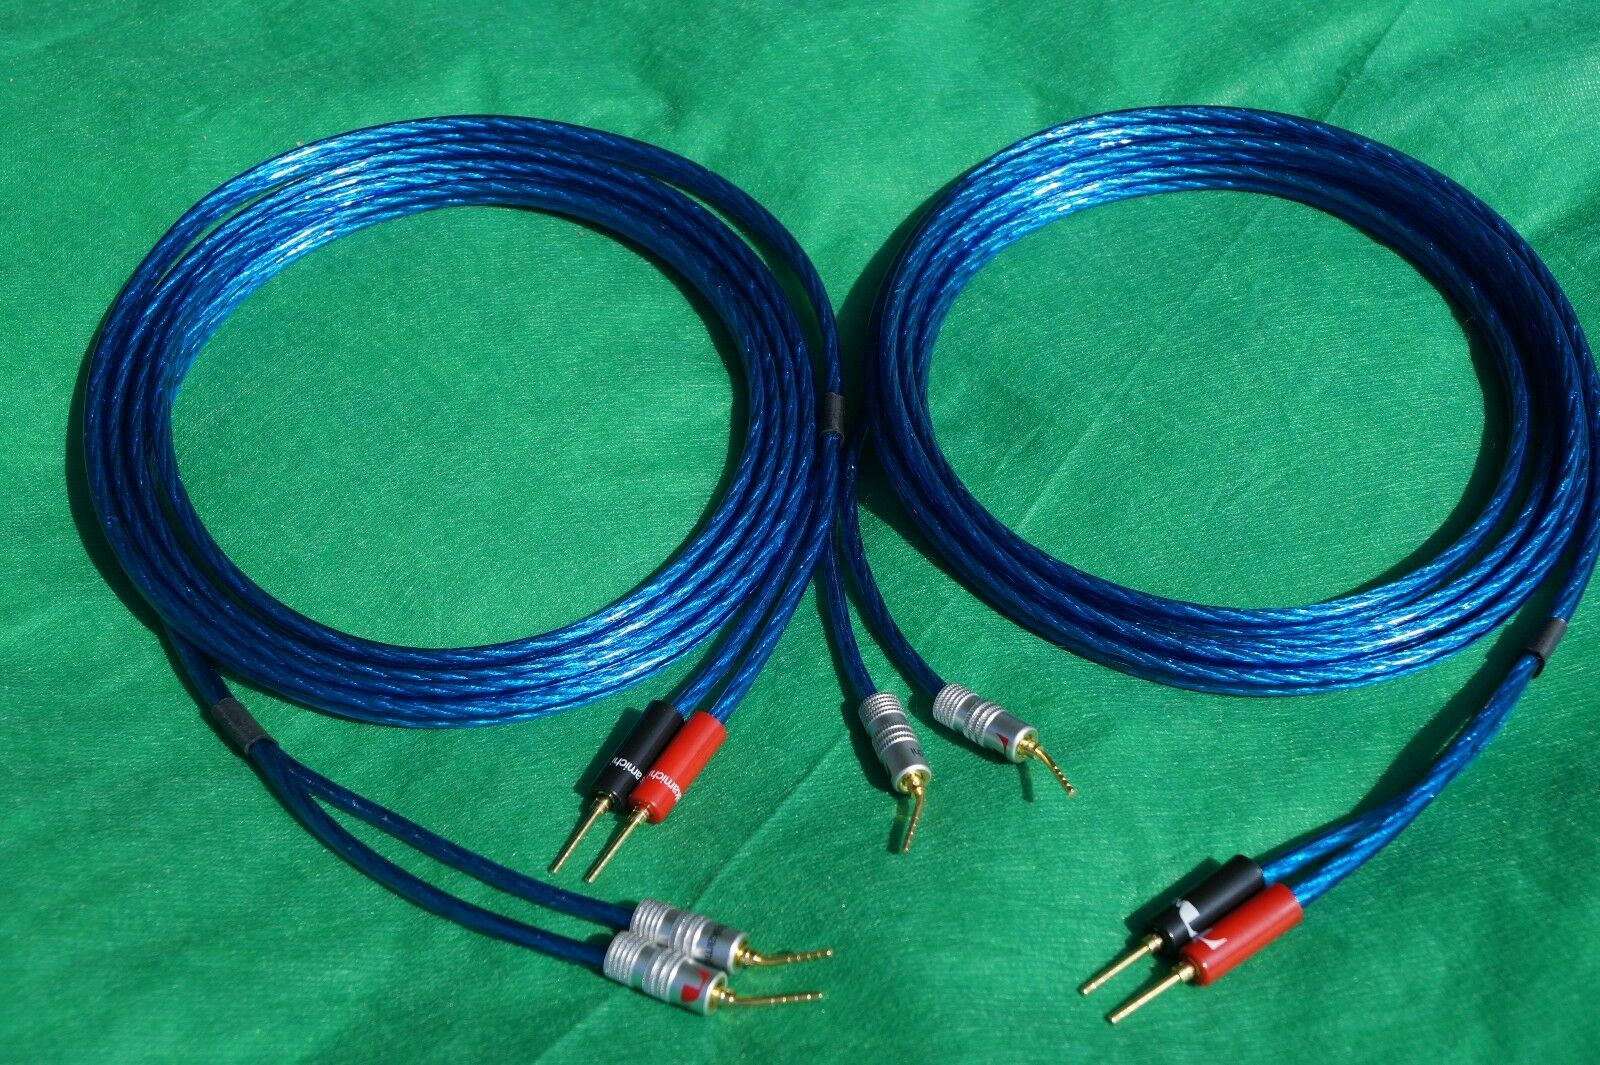 Samurai True 10 Gauge Wire Speaker Cable to Angle Pin Plugs Pair 3 ...